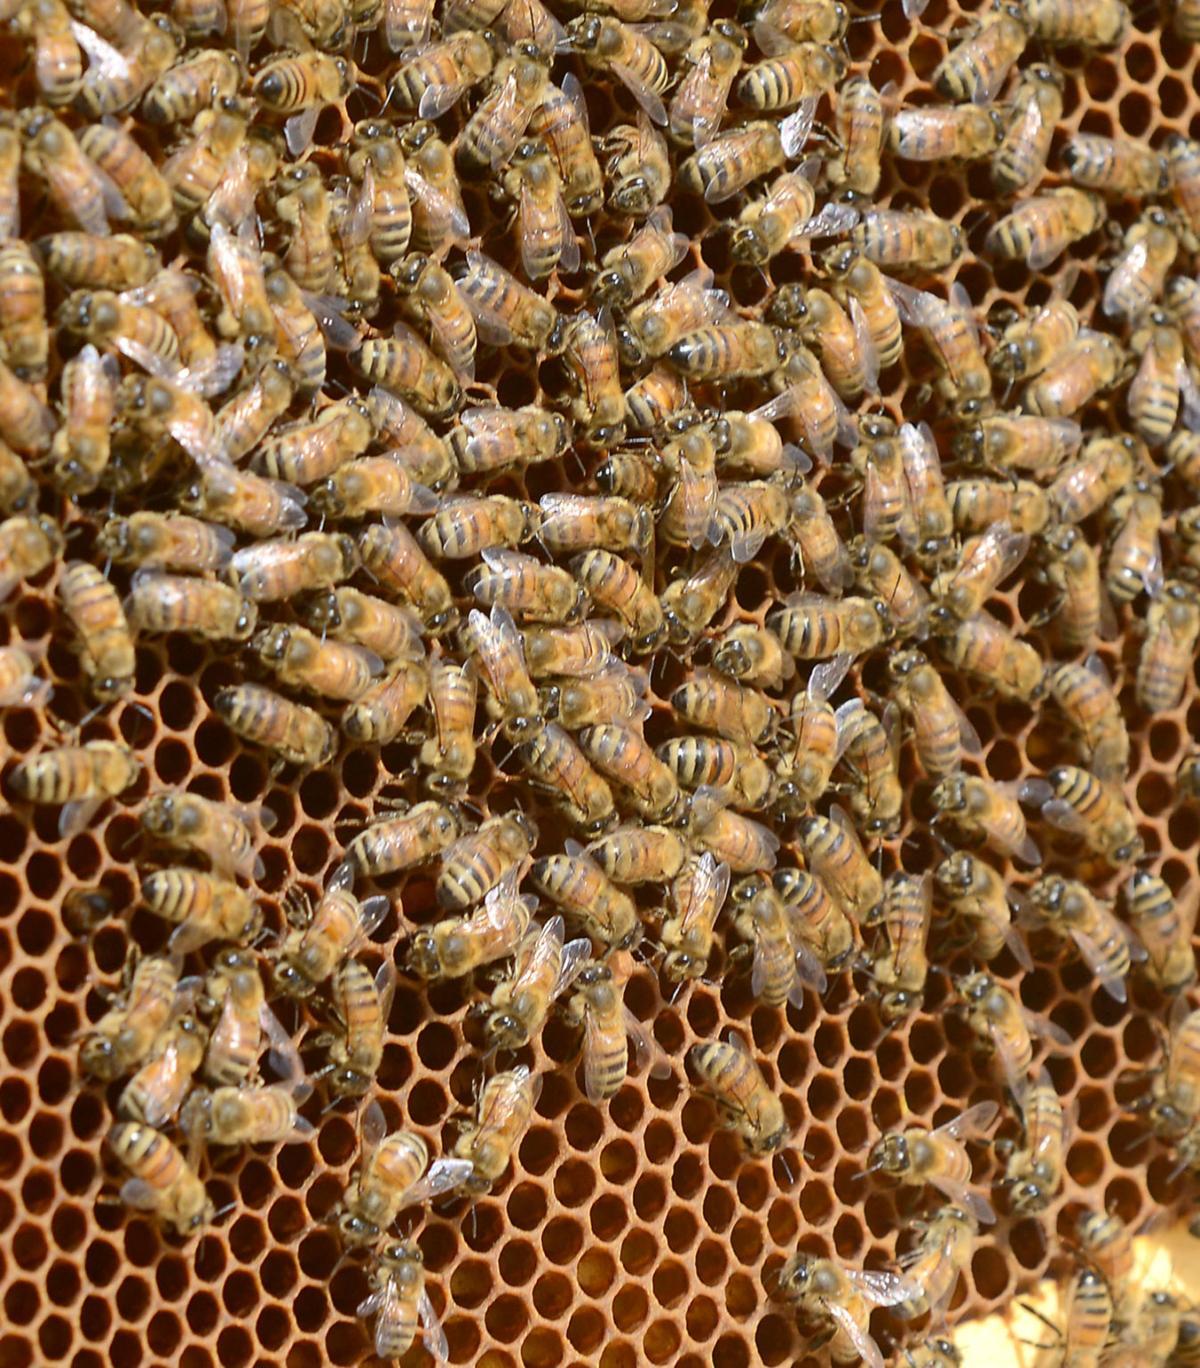 Honey Bees 06